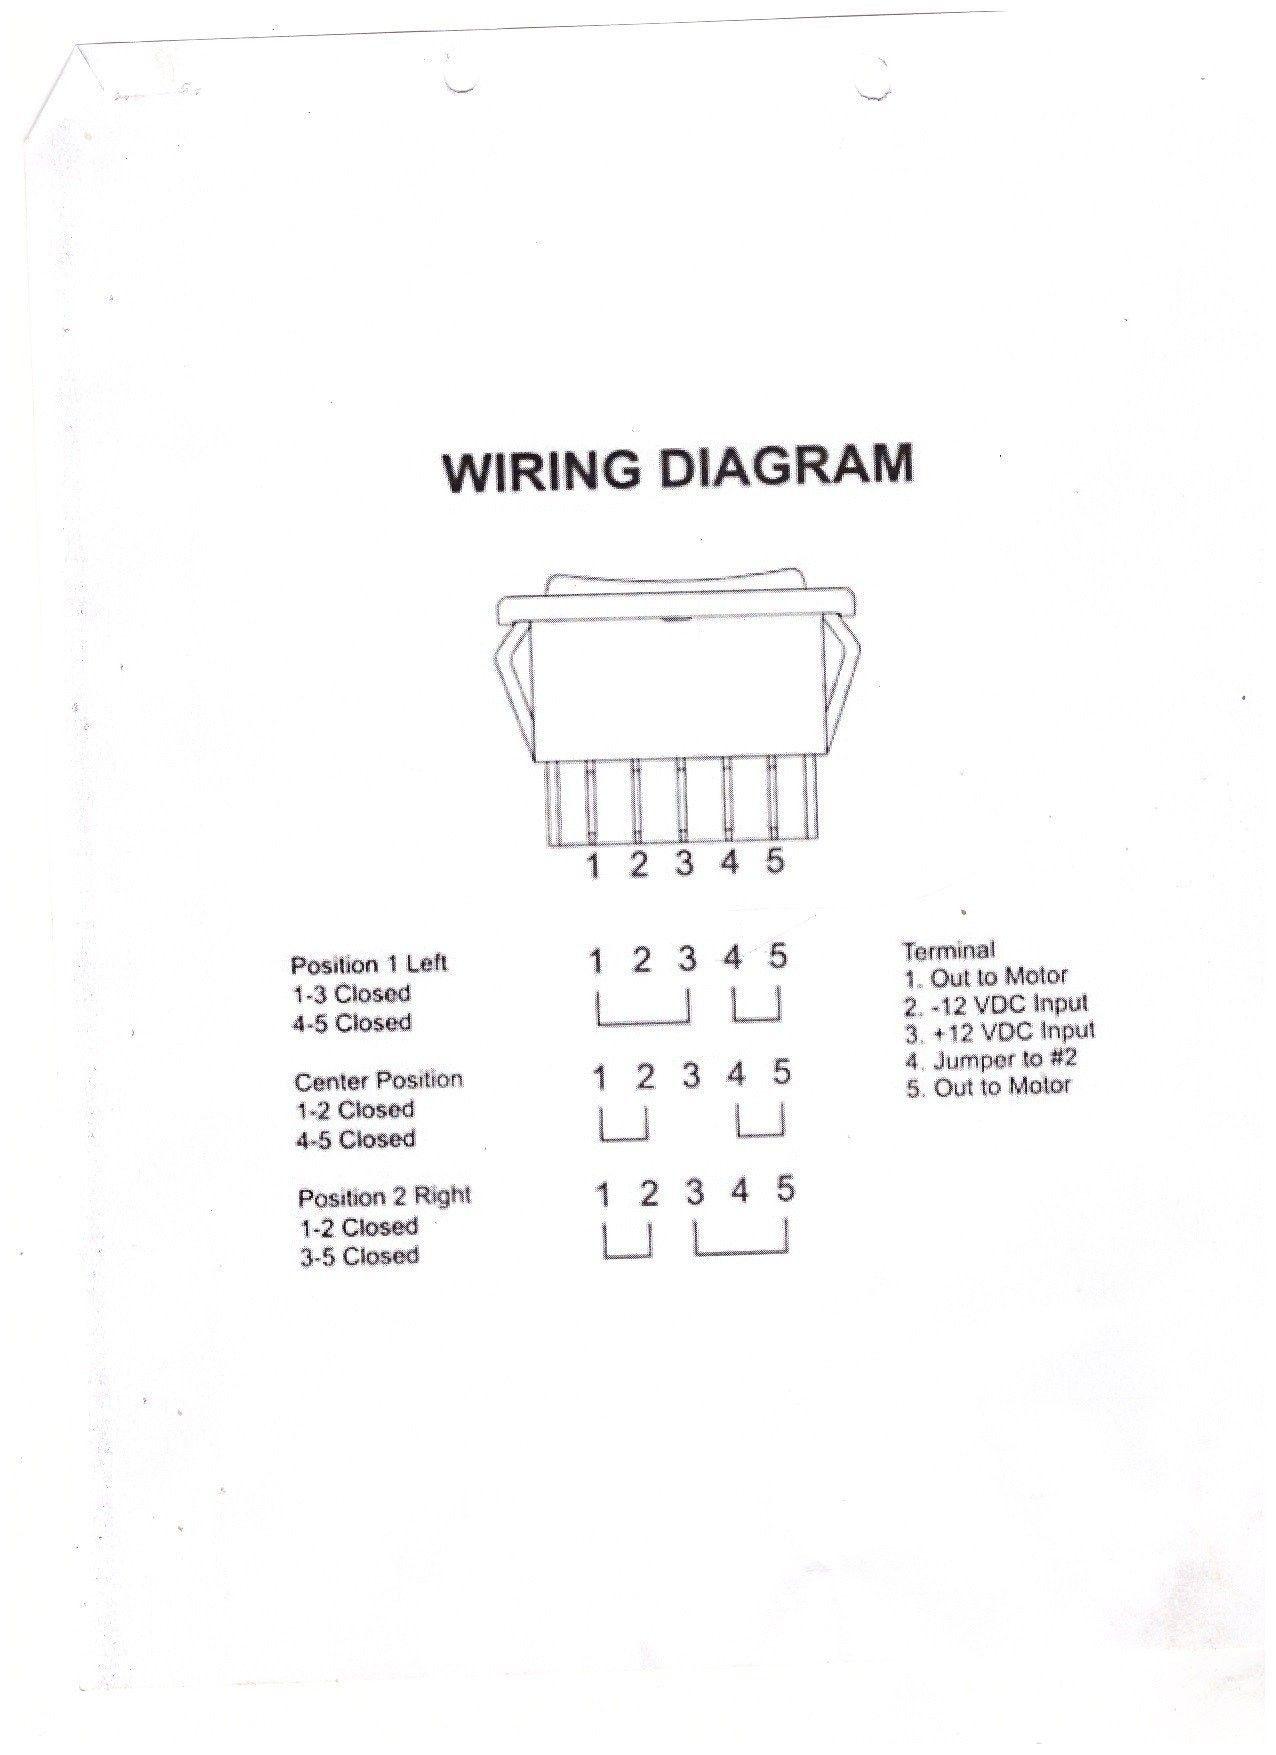 5 Pin Power Window Switch Wiring Diagram New In 2020 Diagram Trailer Wiring Diagram Wire